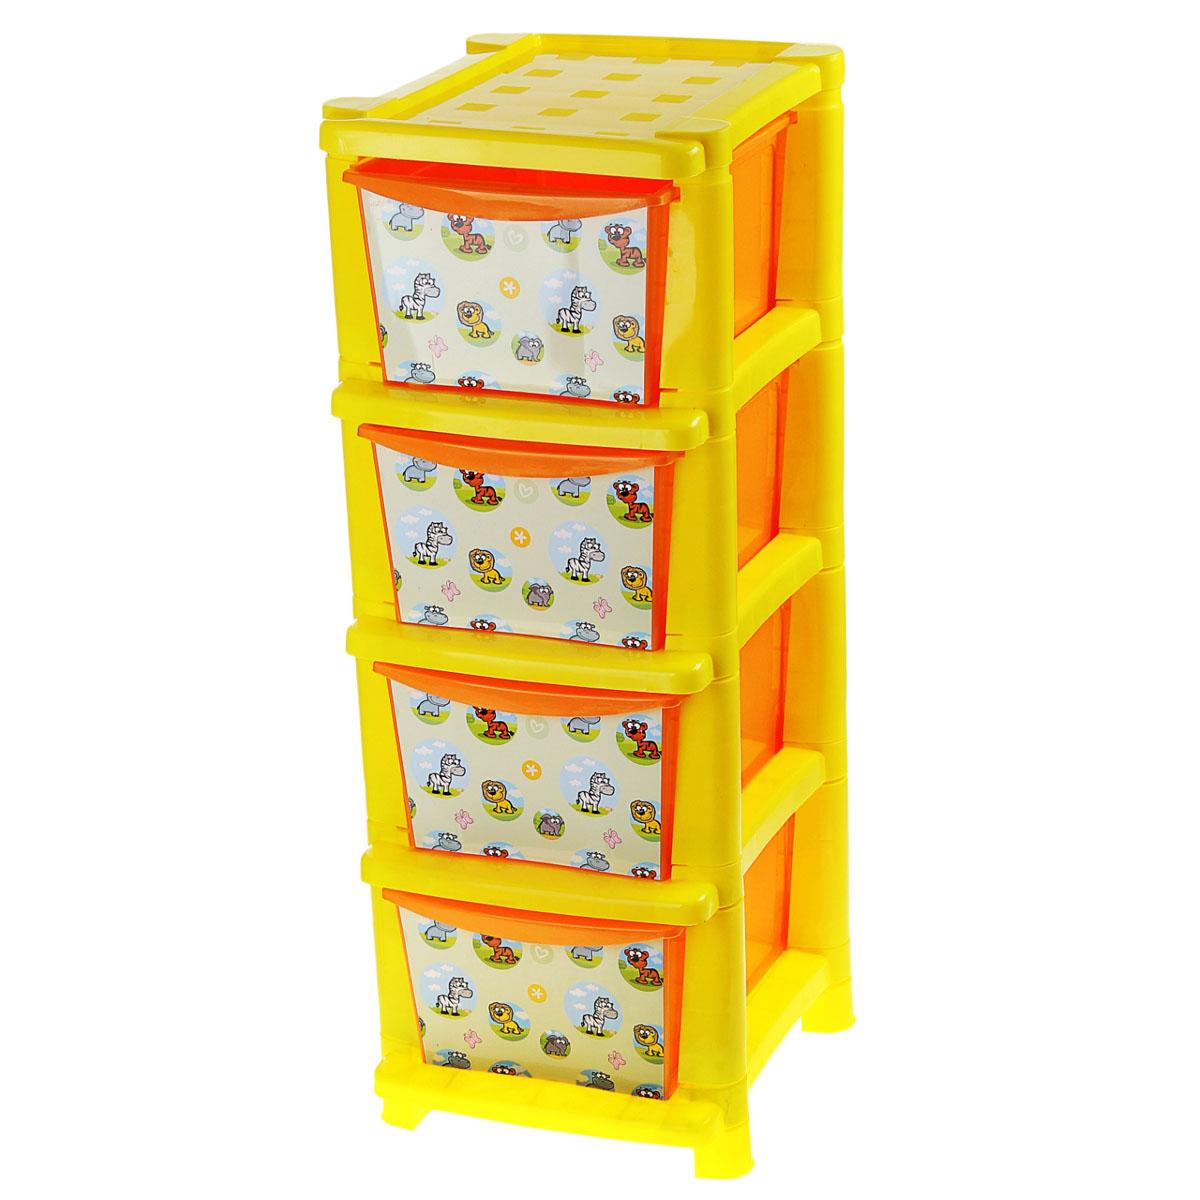 "Комод детский Plastic Centre ""Африка"", цвет: желтый, оранжевый, 33,5 х 41 х 86,7 см"